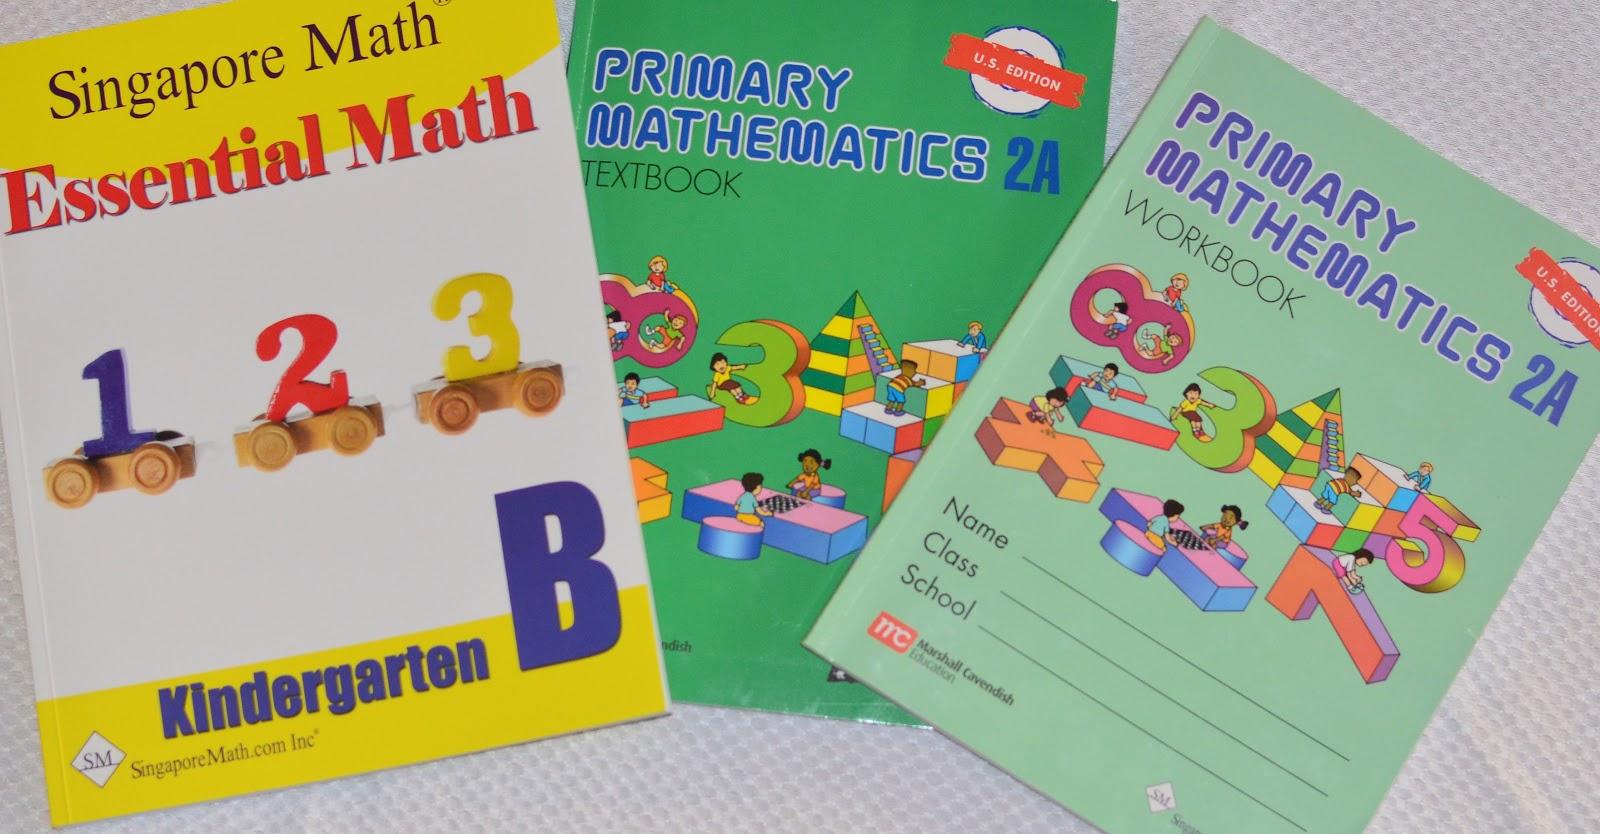 Workbooks » Singapore Math Workbooks - Free Printable Worksheets for ...